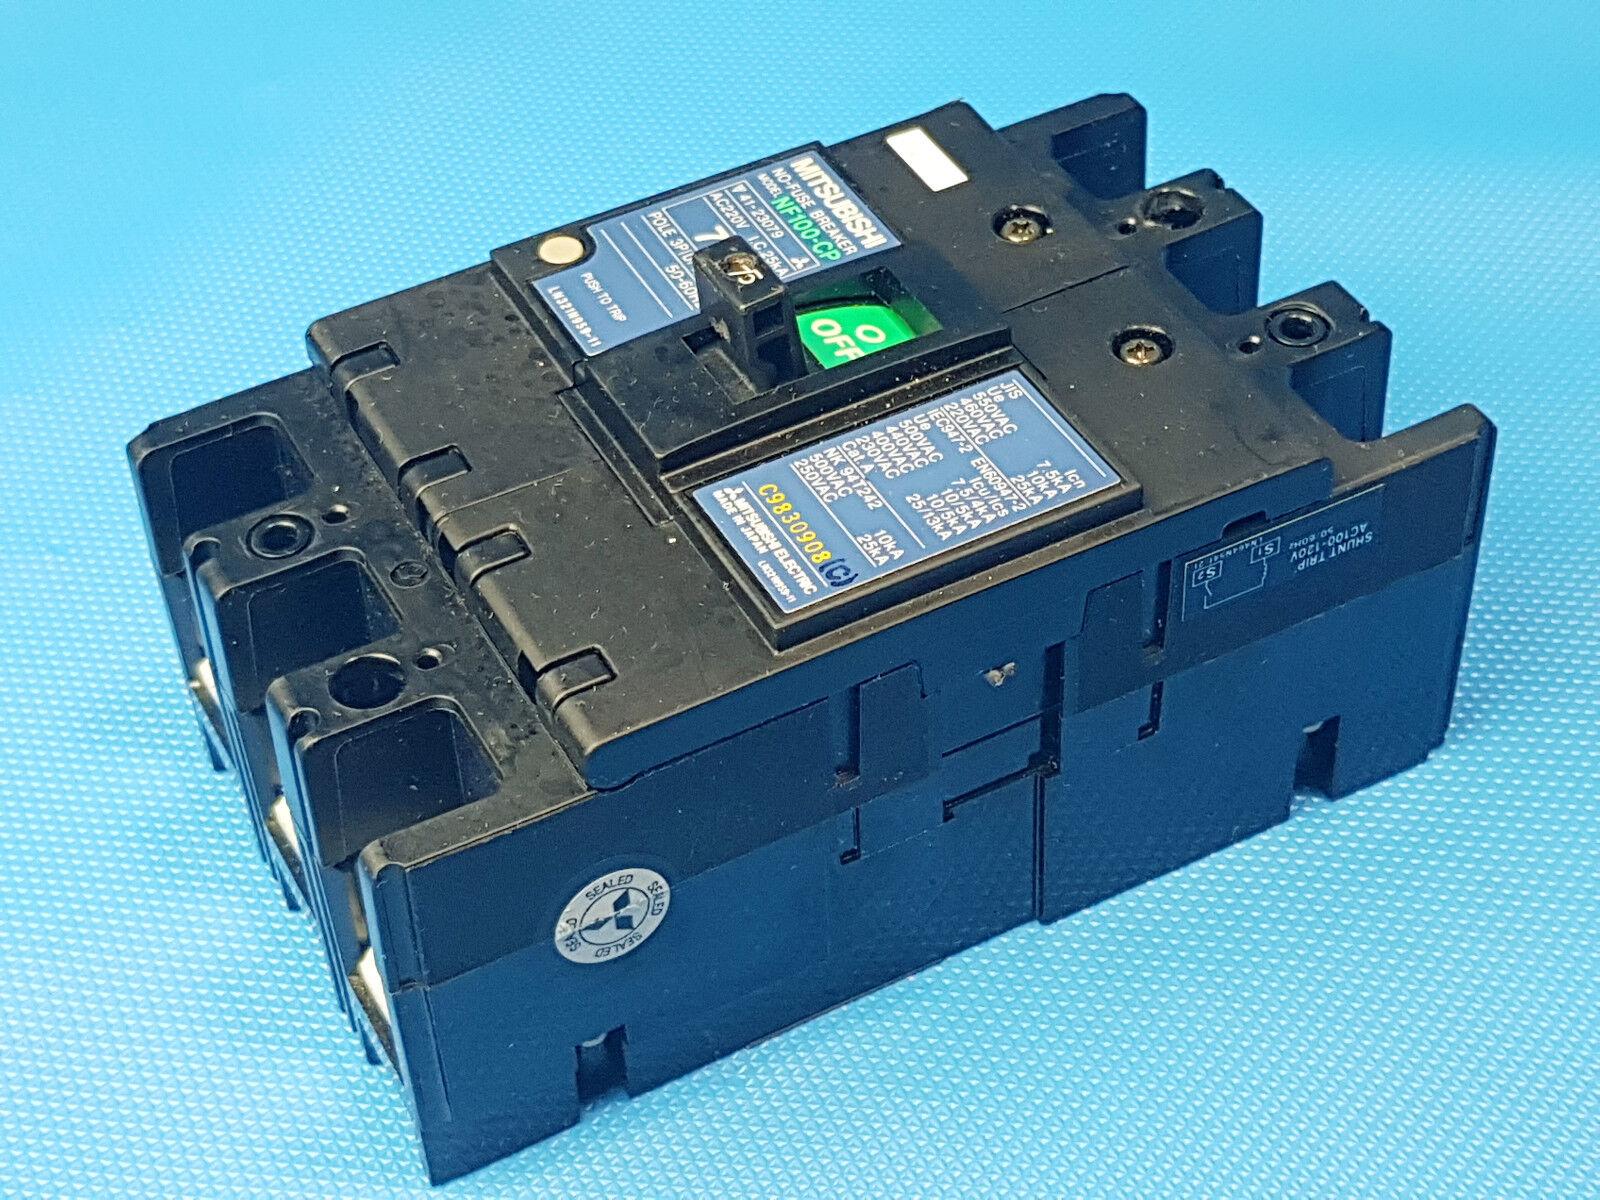 Mitsubishi NF100-CP No-Fuse Circuit Breaker 75A  Schutzschalter inkl. Rechnung